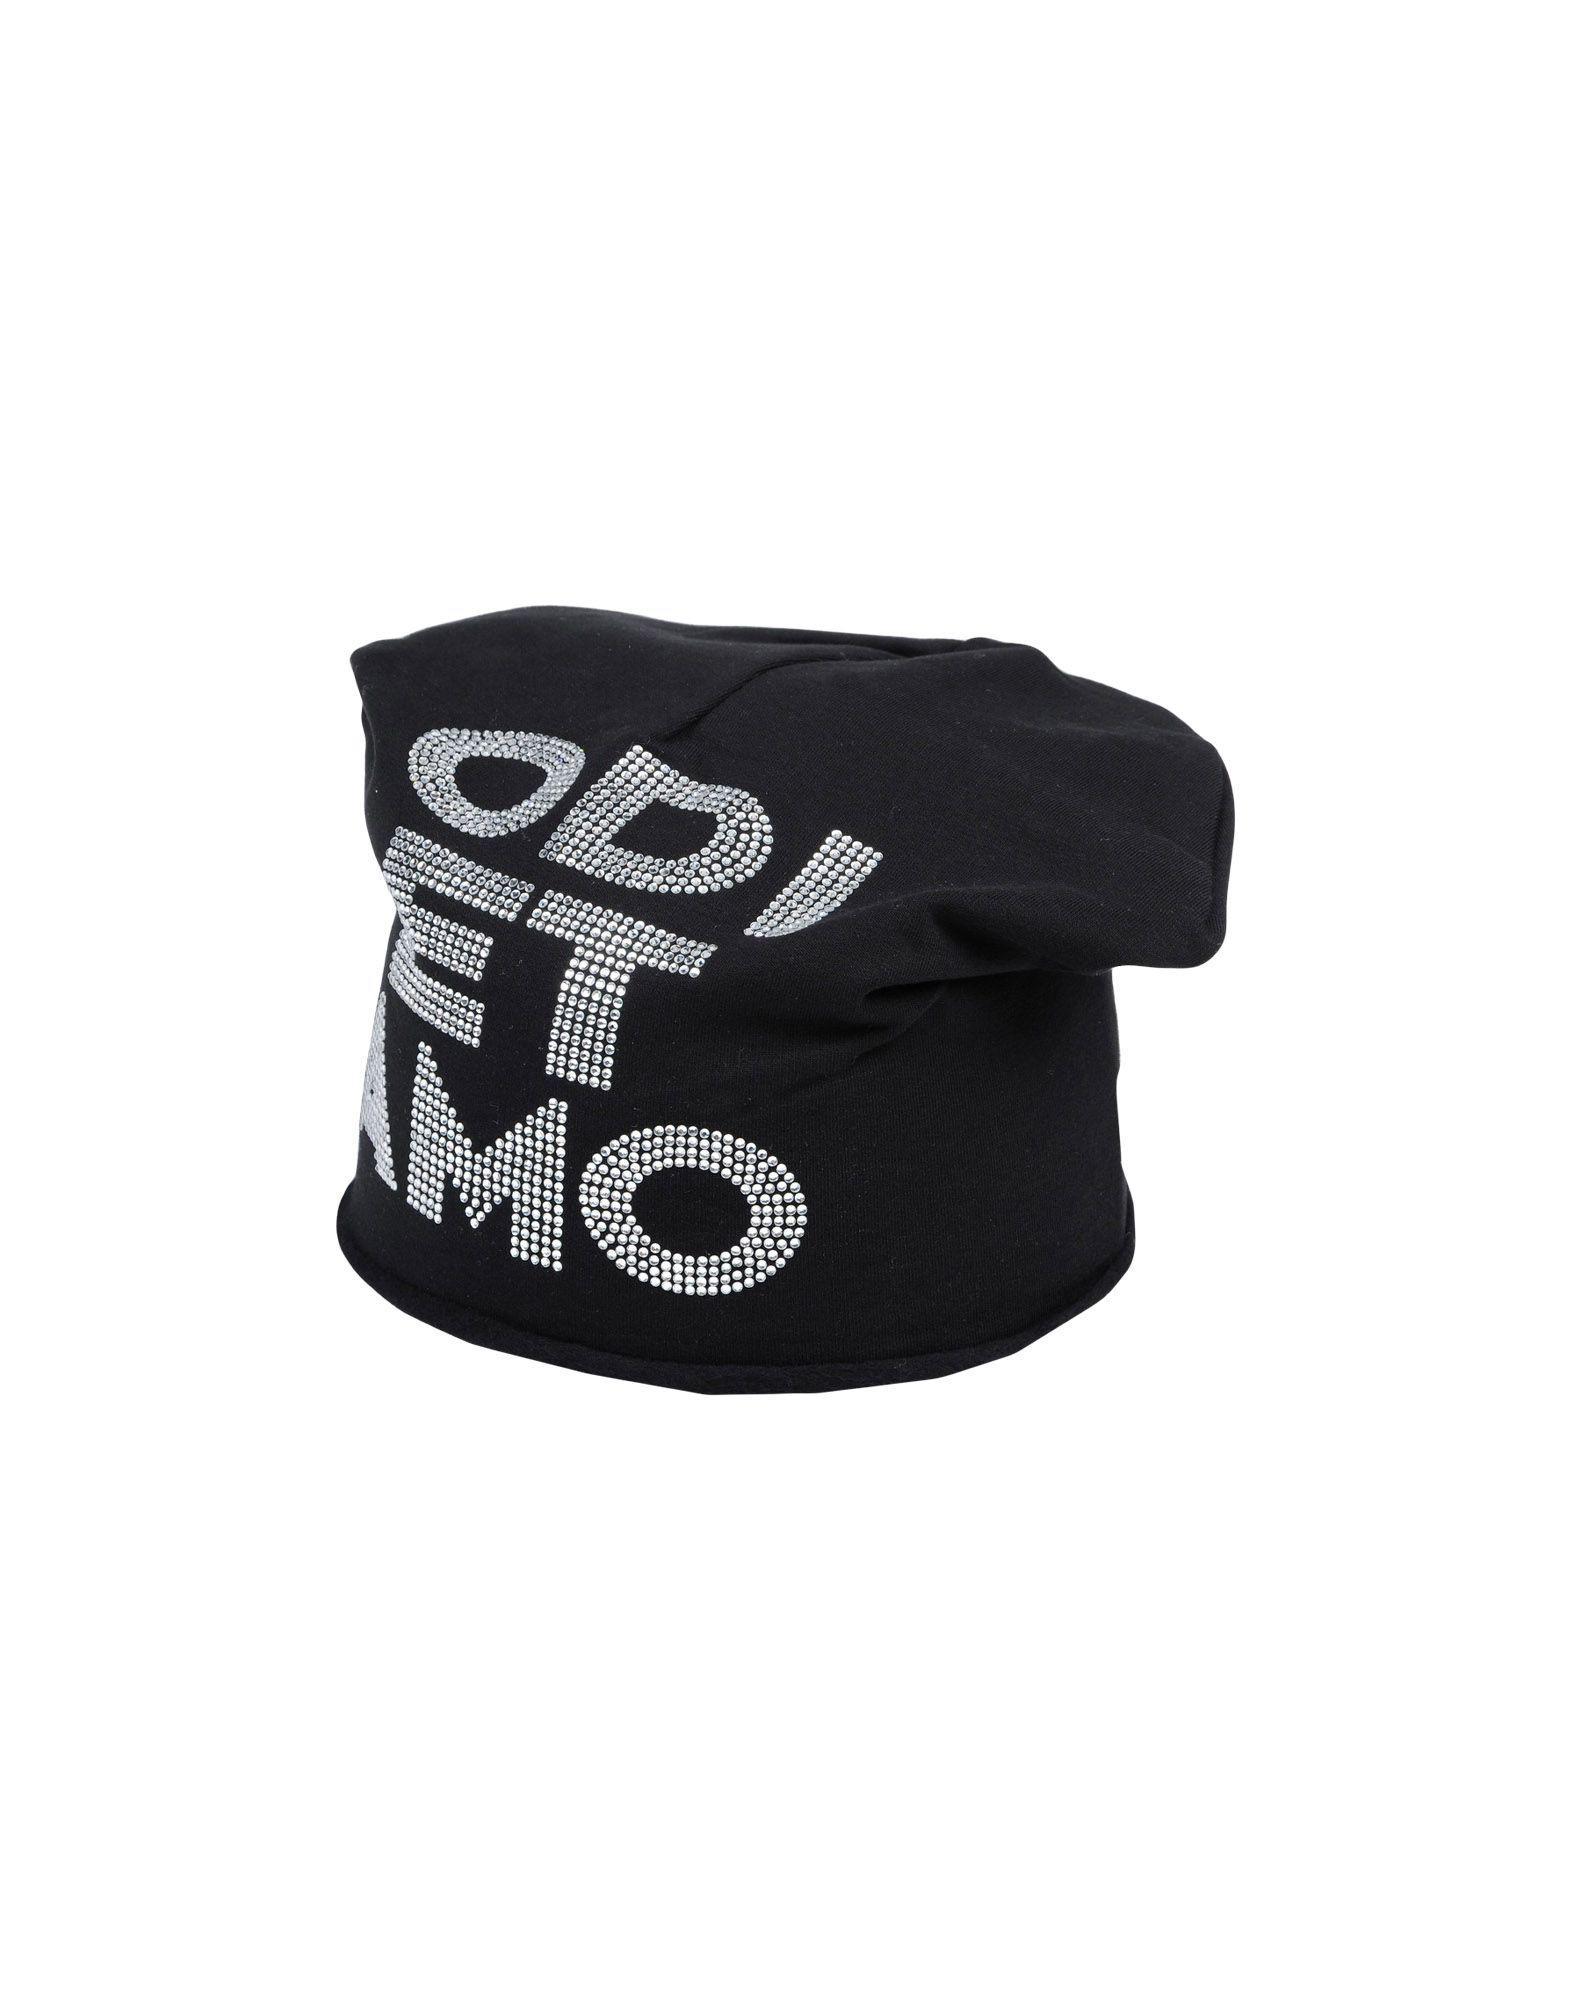 ACCESSORIES - Hats Odi Et Amo fRCmTj